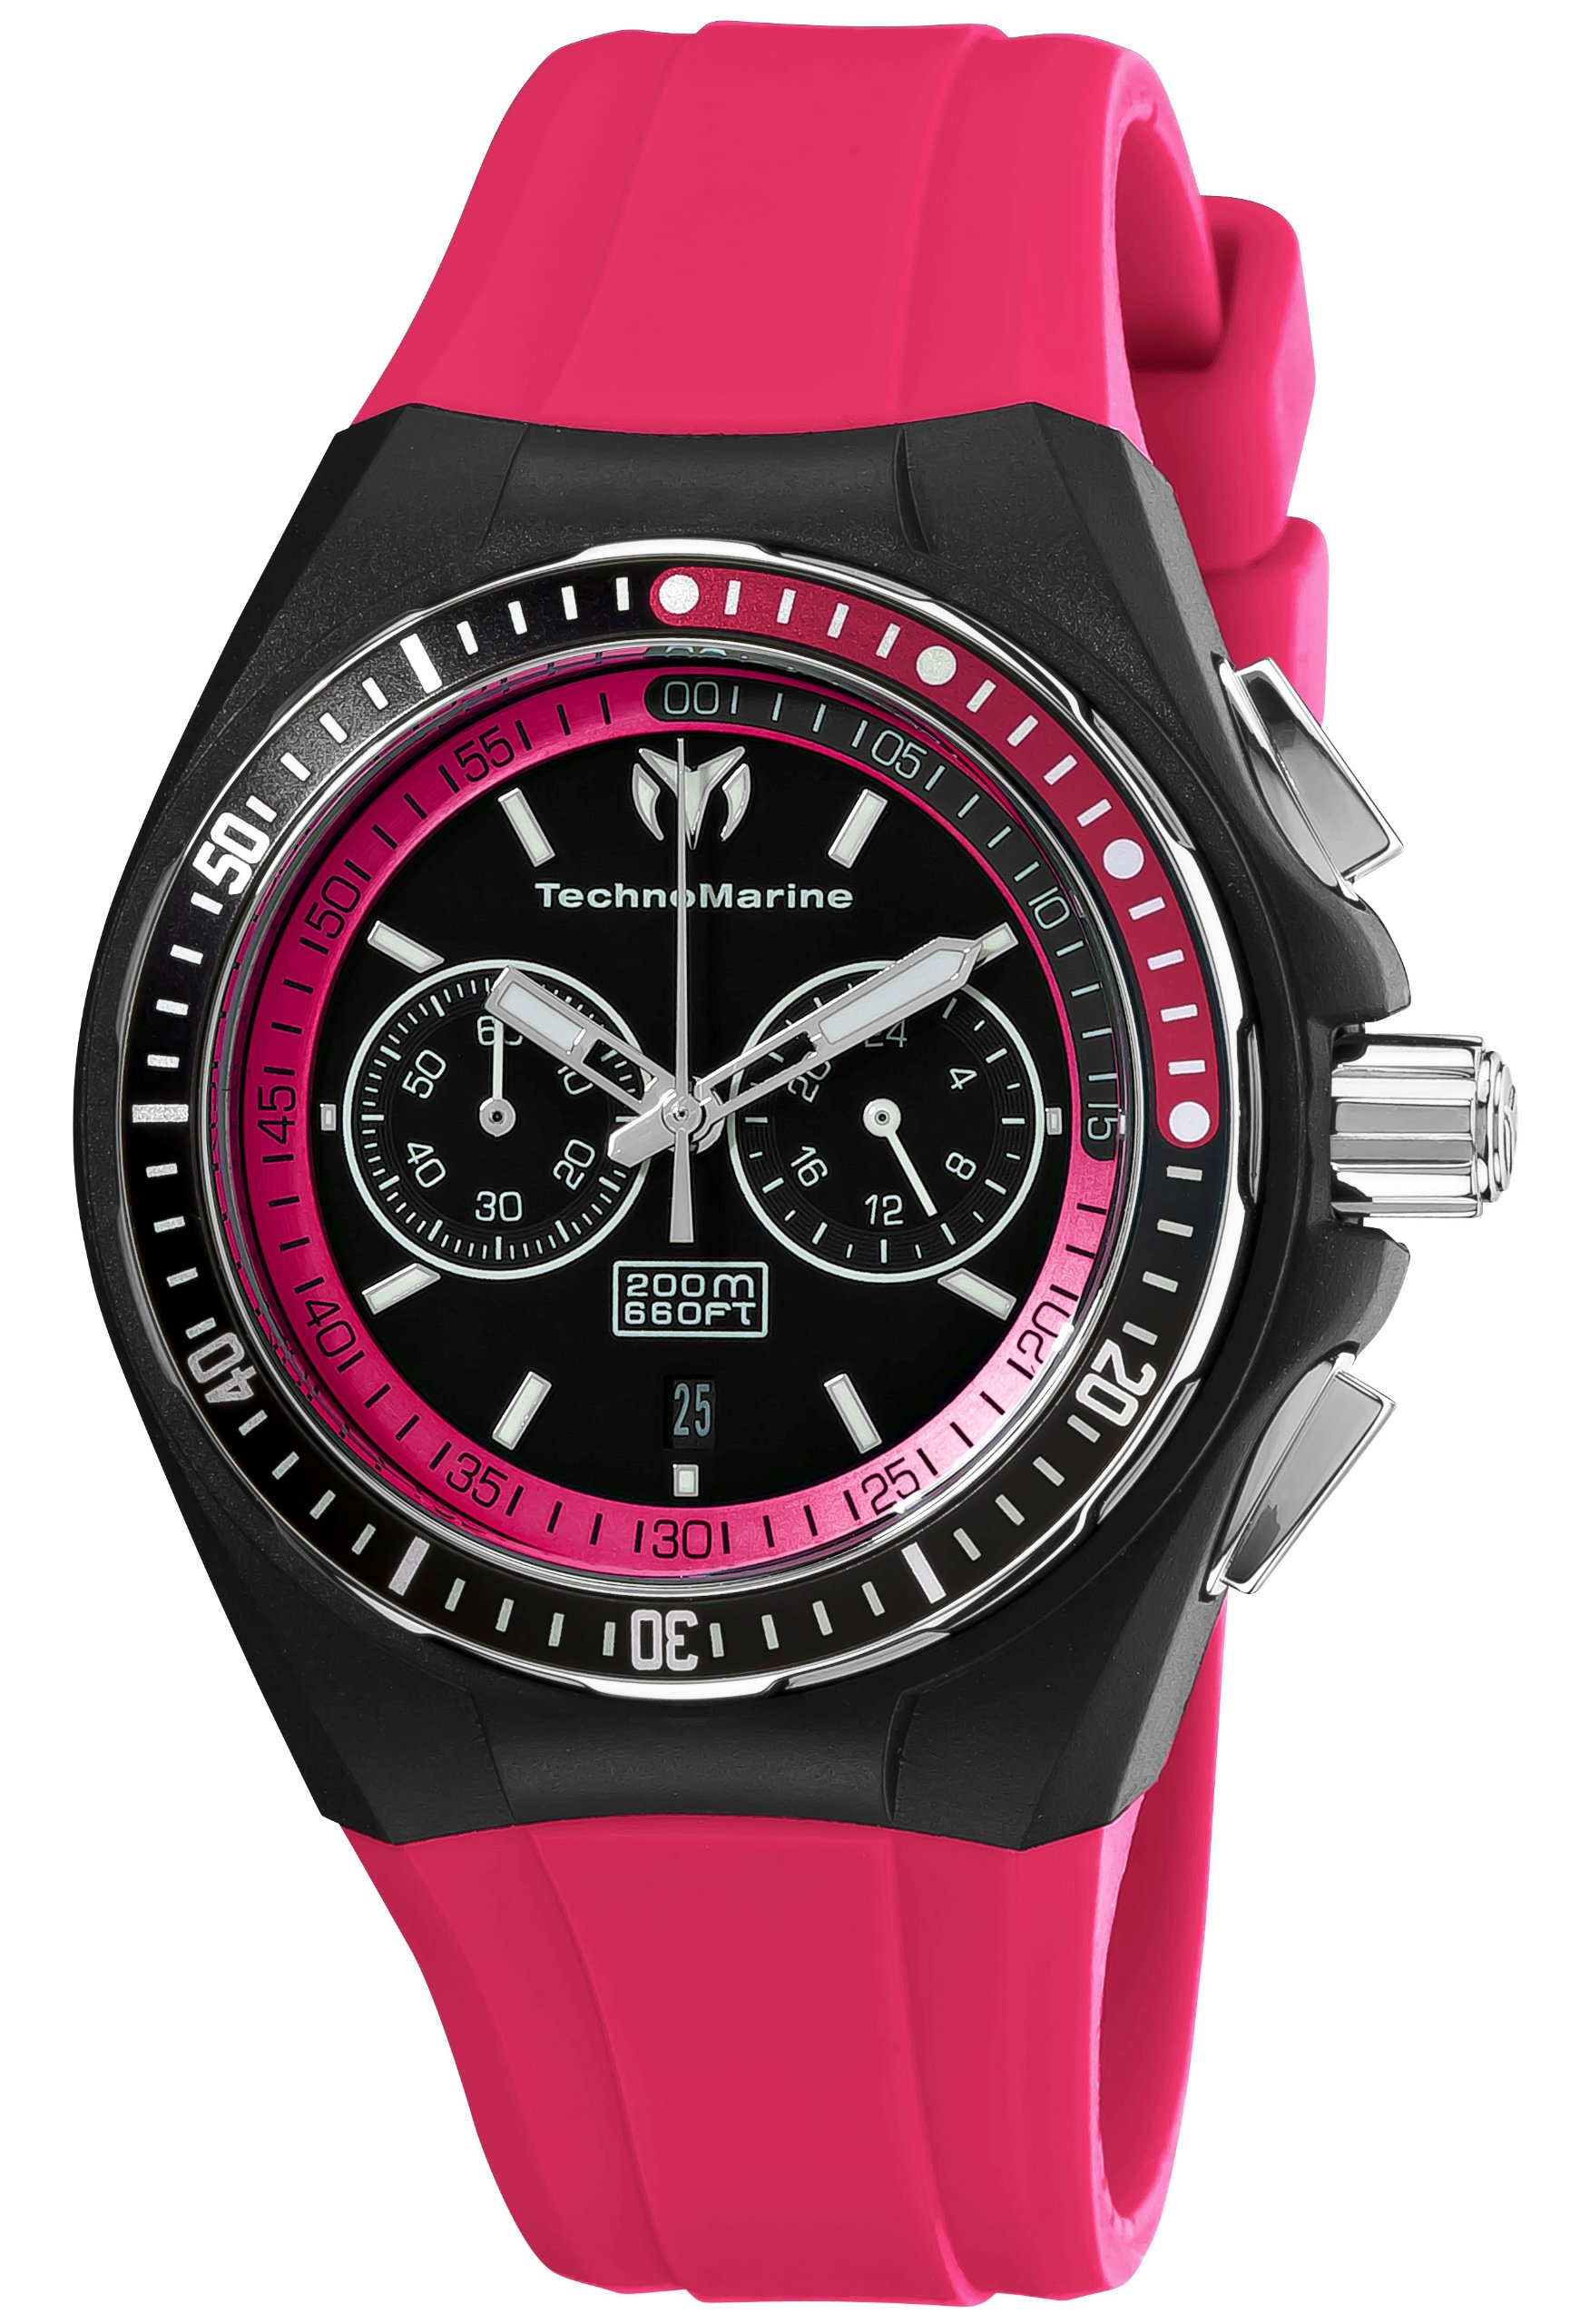 TechnoMarine Unisex 110016 Cruise Sport Chronograph Black and Pink Dial Watch